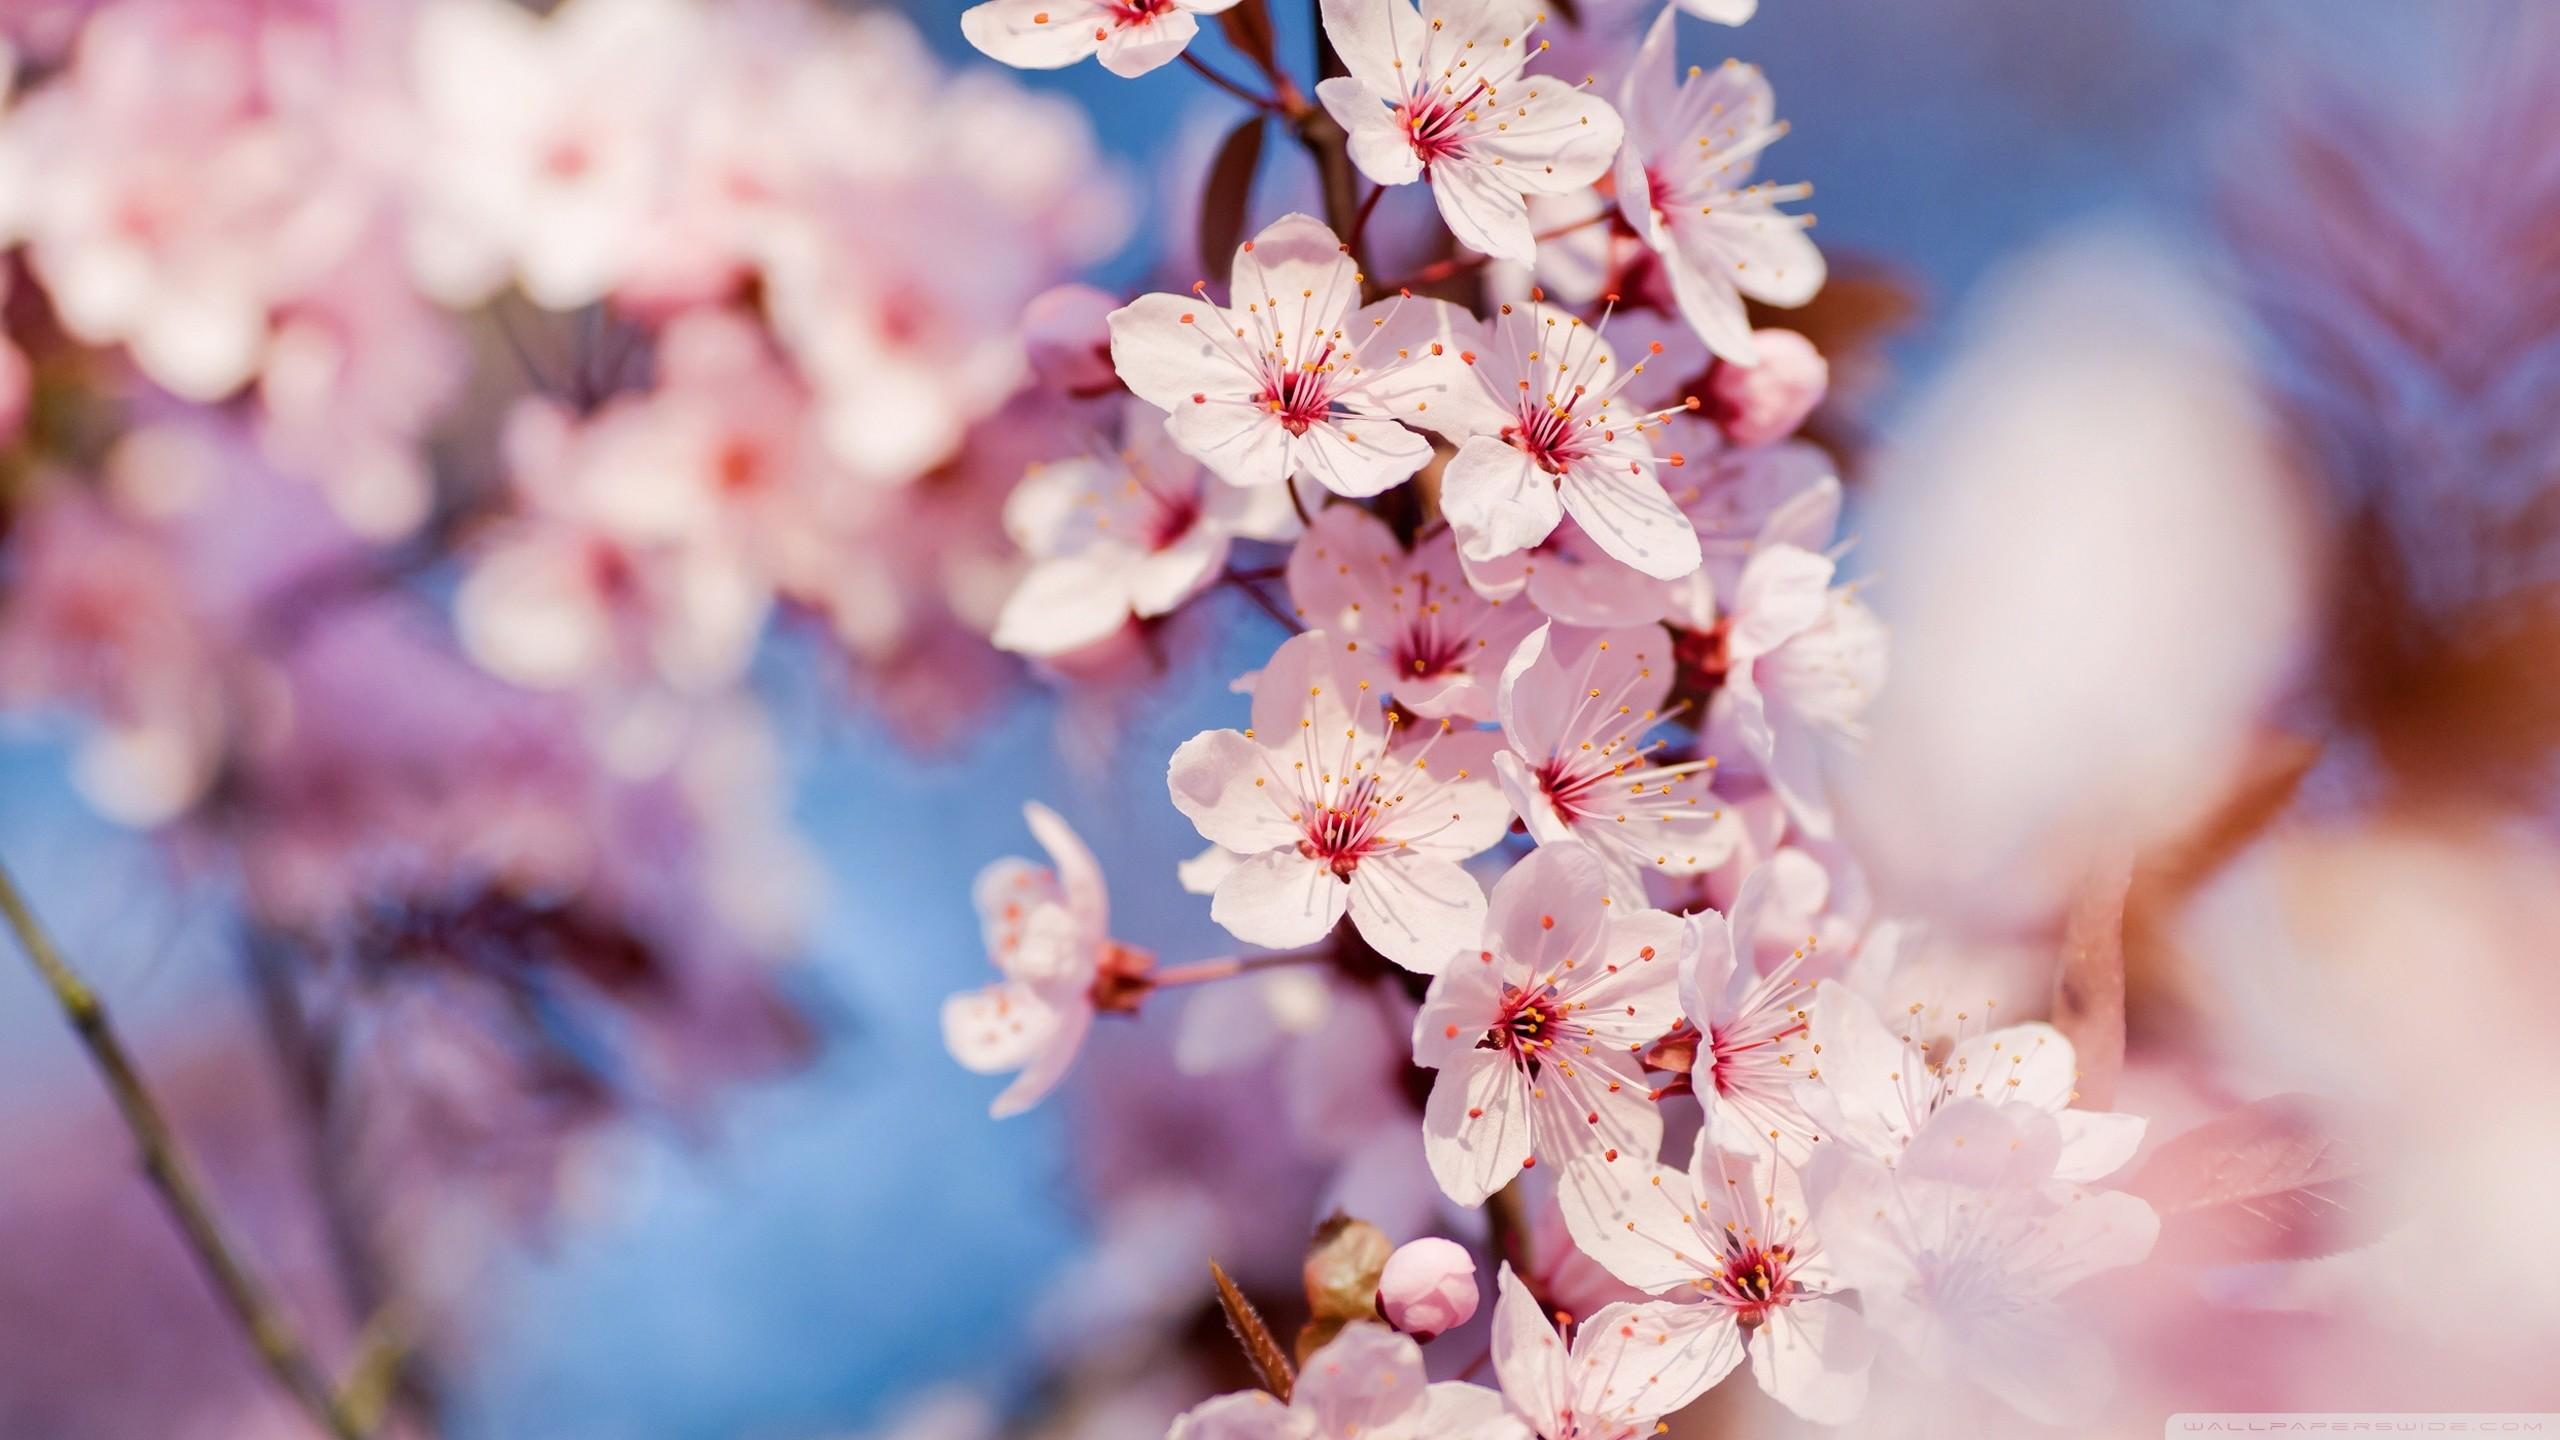 Blossom · Blossom Wallpaper